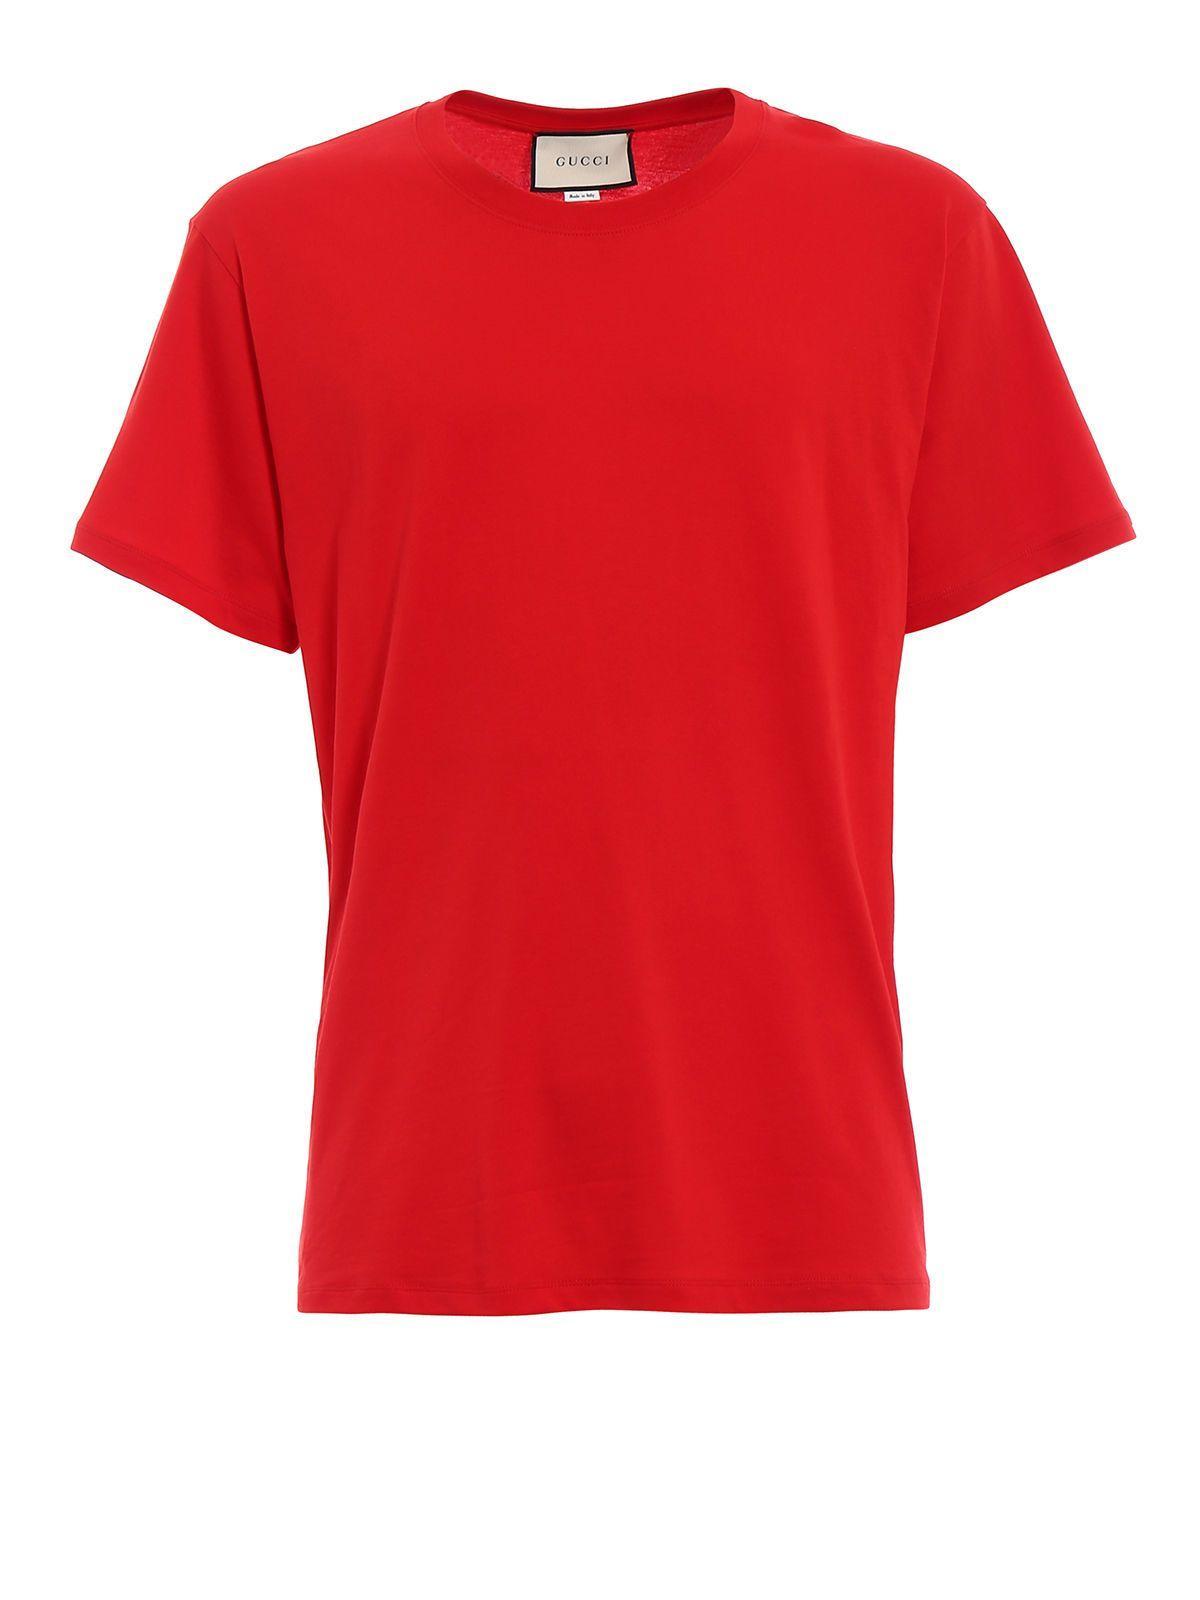 Gucci Logo Print T-shirt In Live Red-bluette